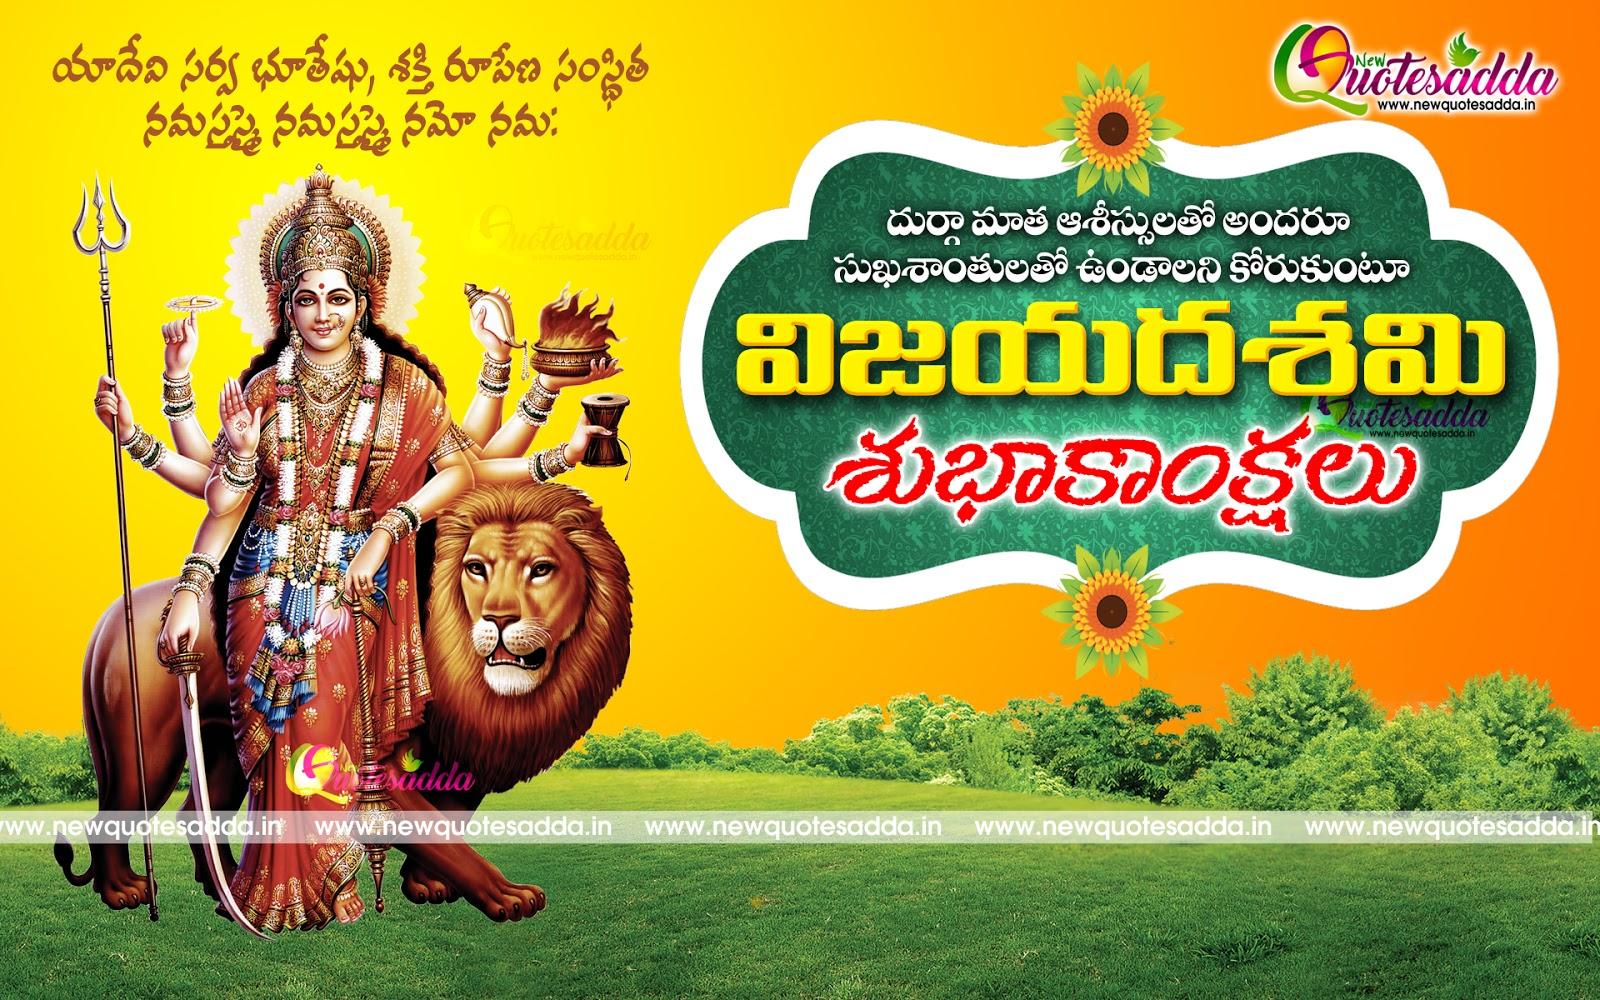 Happy Dussehra Telugu Quotes And Greetings Online Newquotesadda